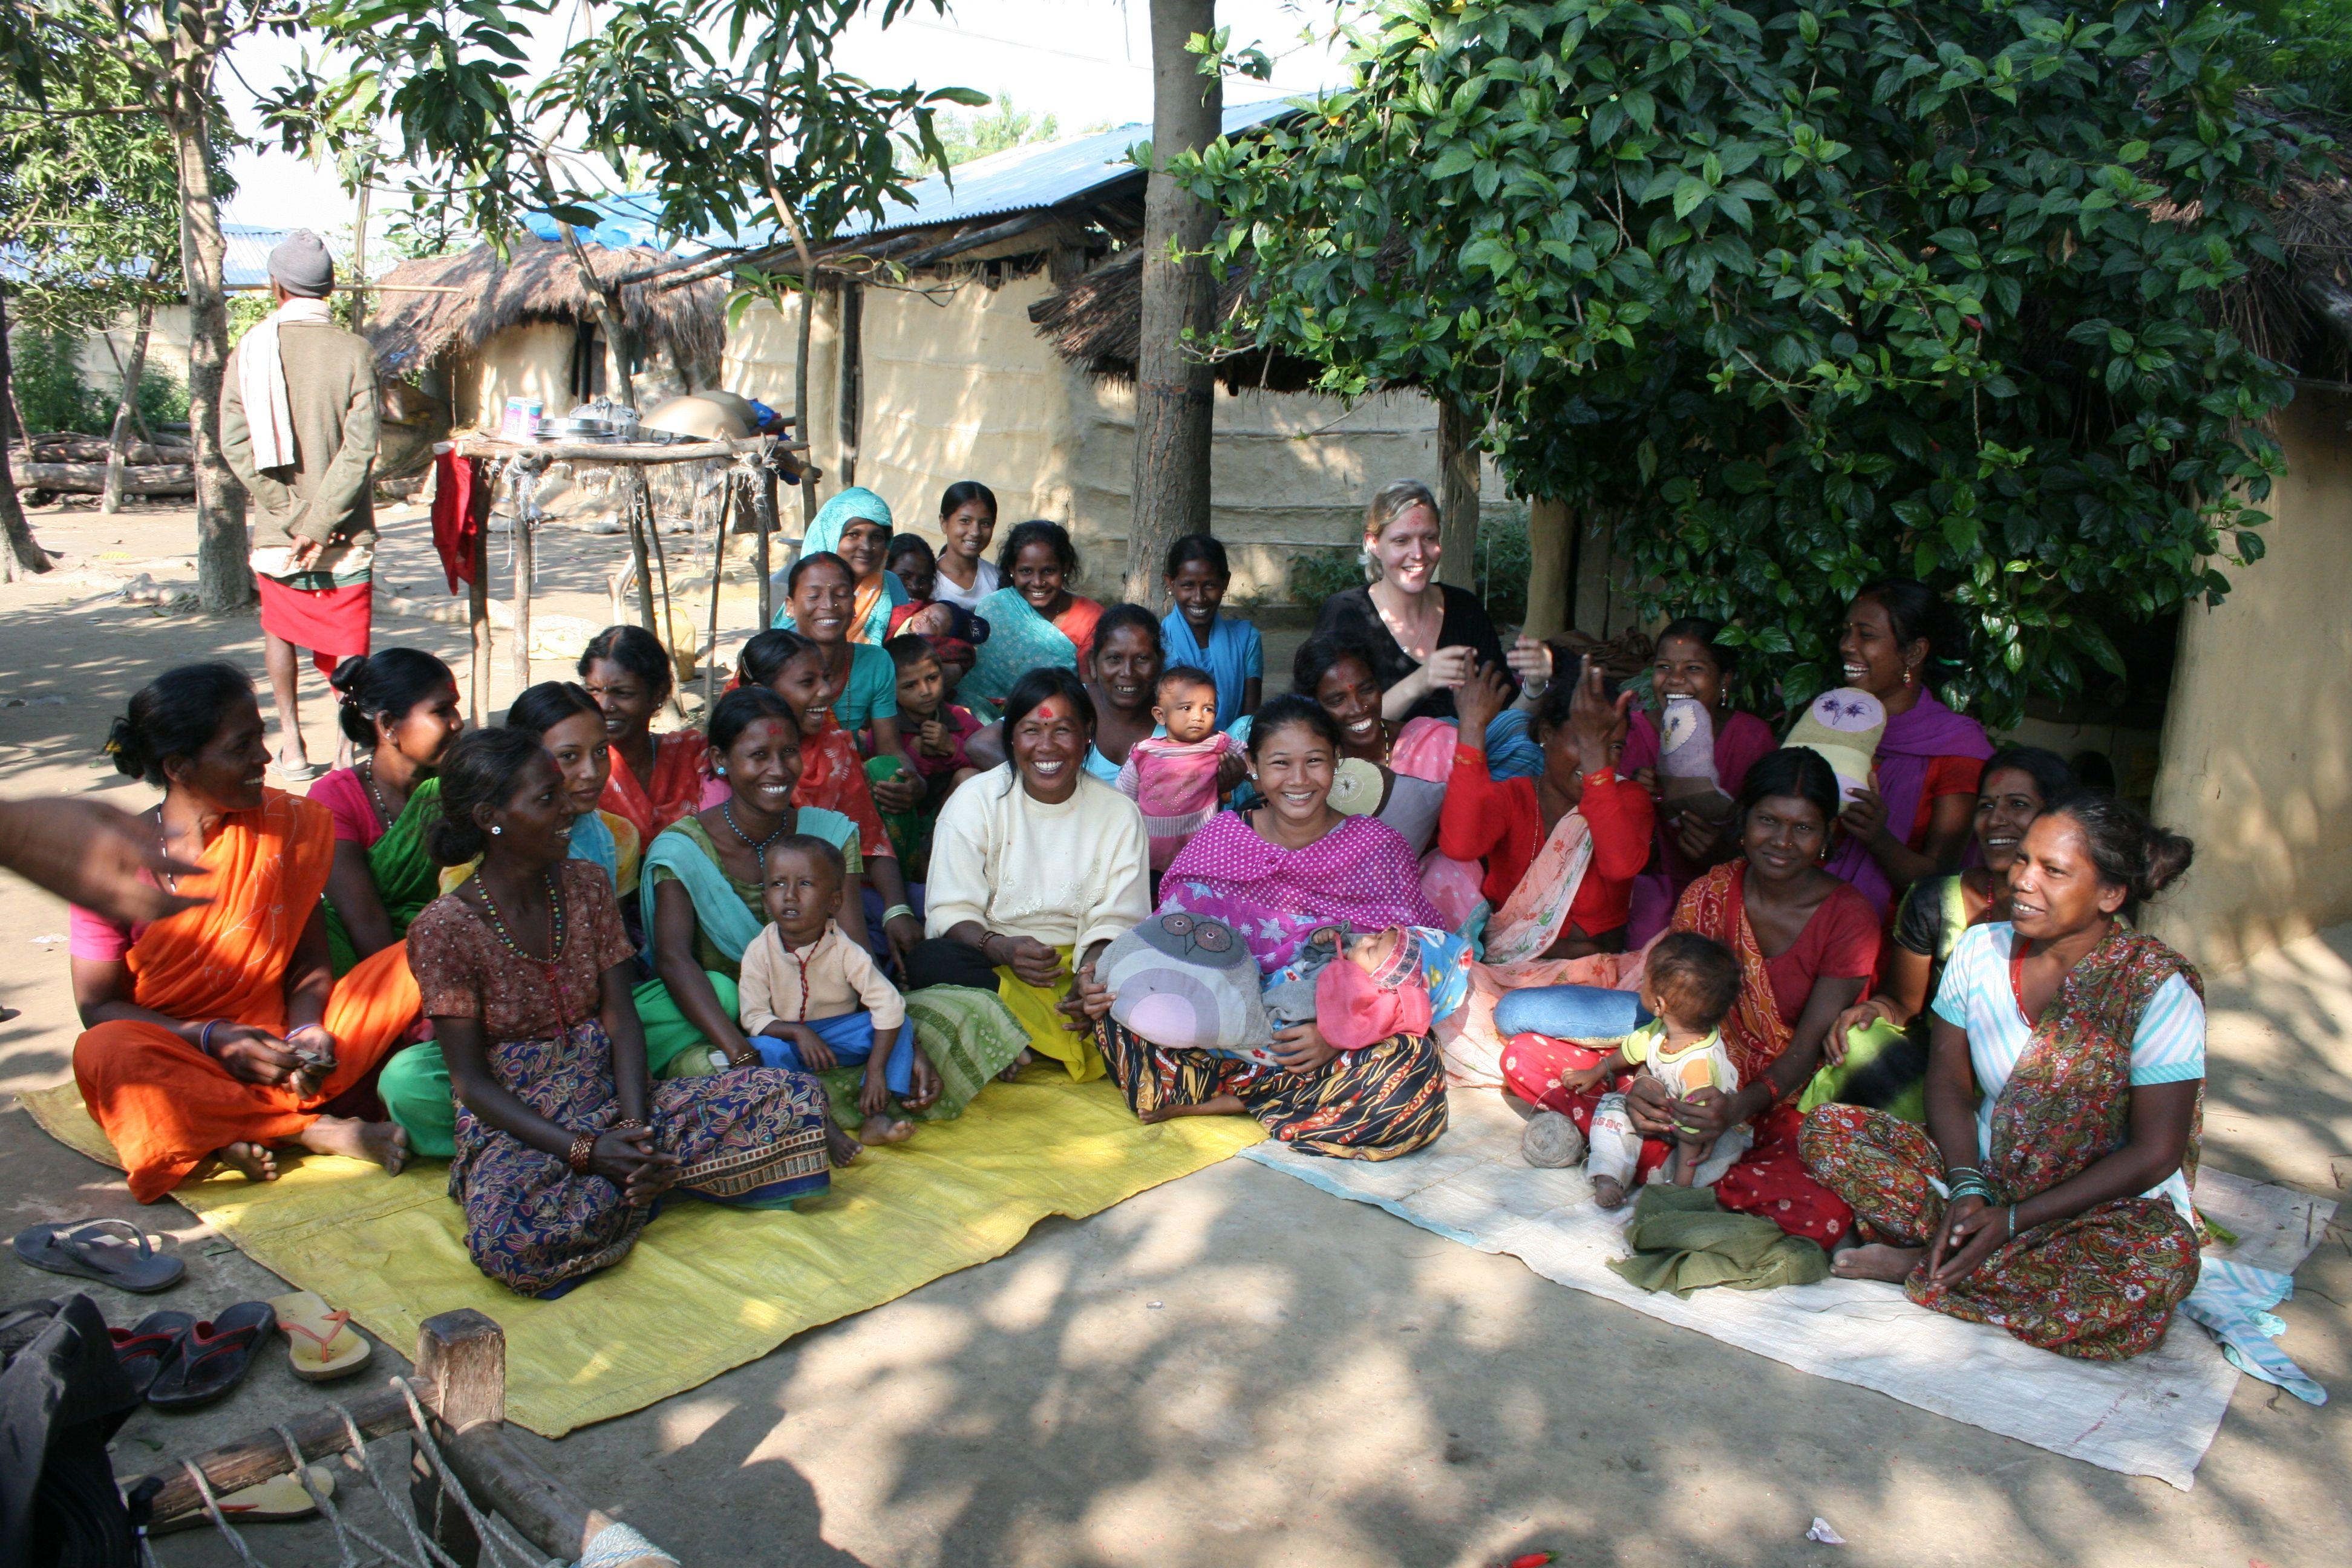 21 kvinder fra landsbyen Soiya, Karen Vibeke og vores fuglevenner